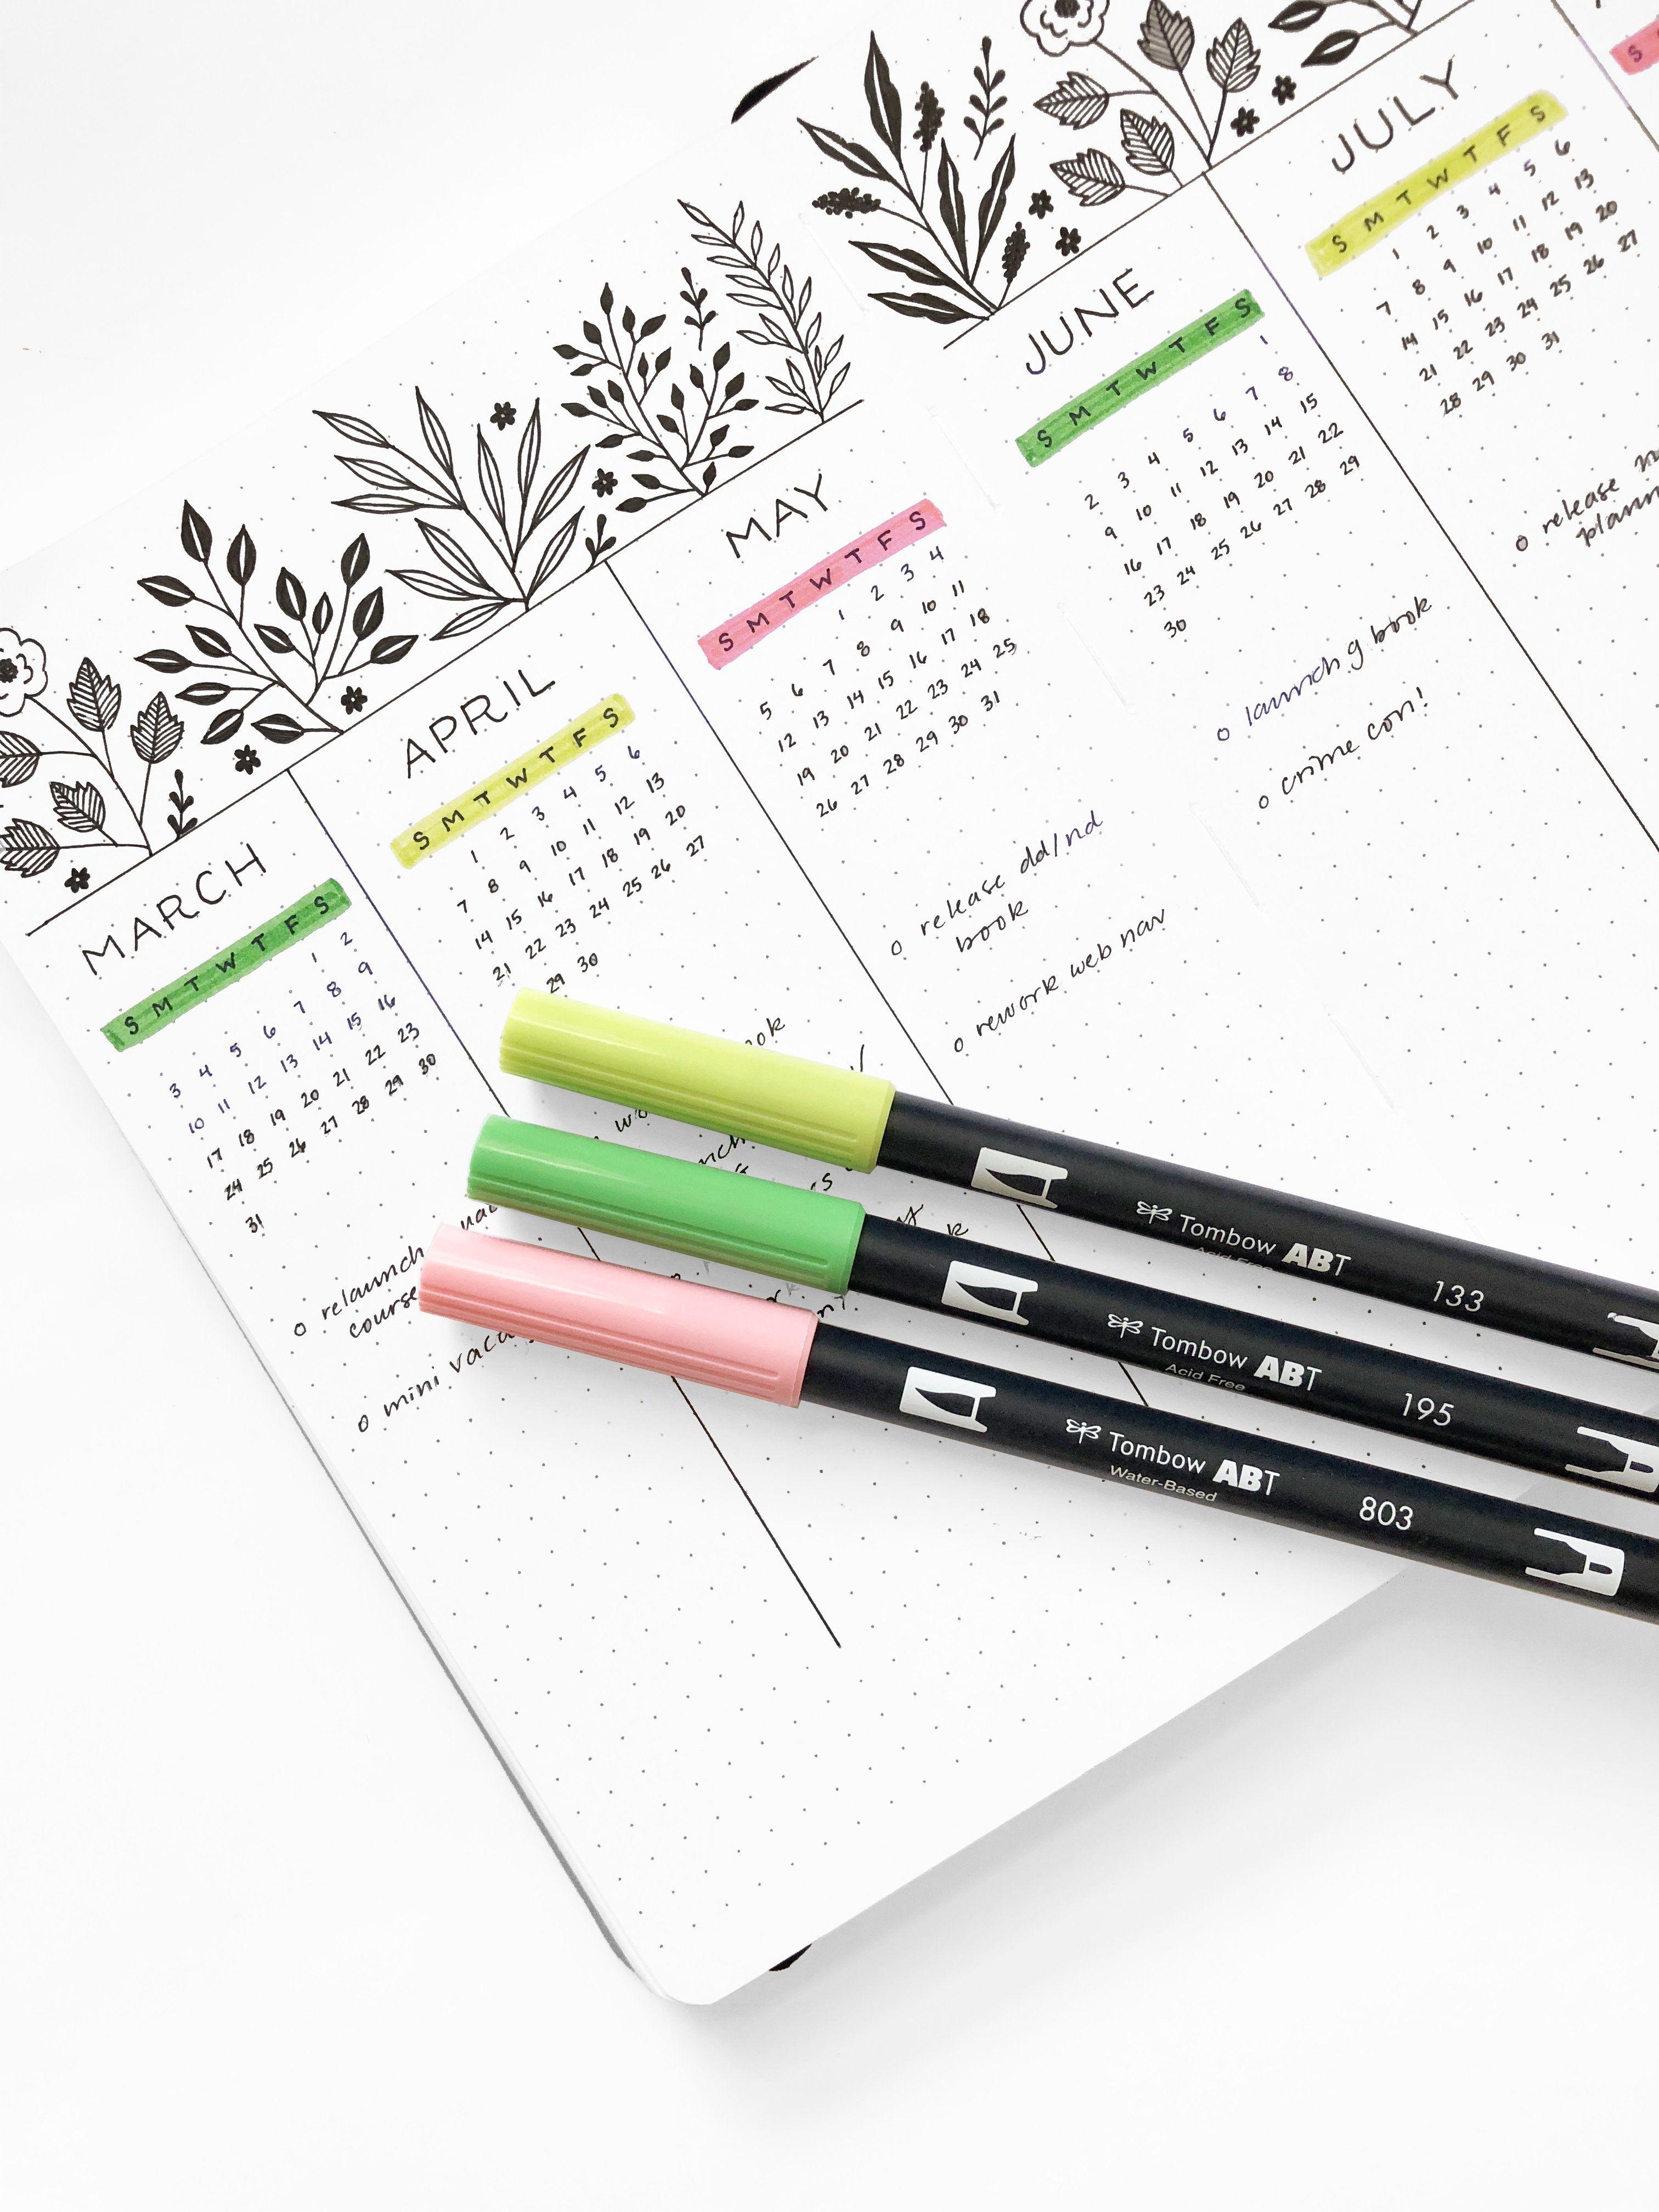 Bullet Journal Layouts for the Vernal Equinox #autumnalequinox